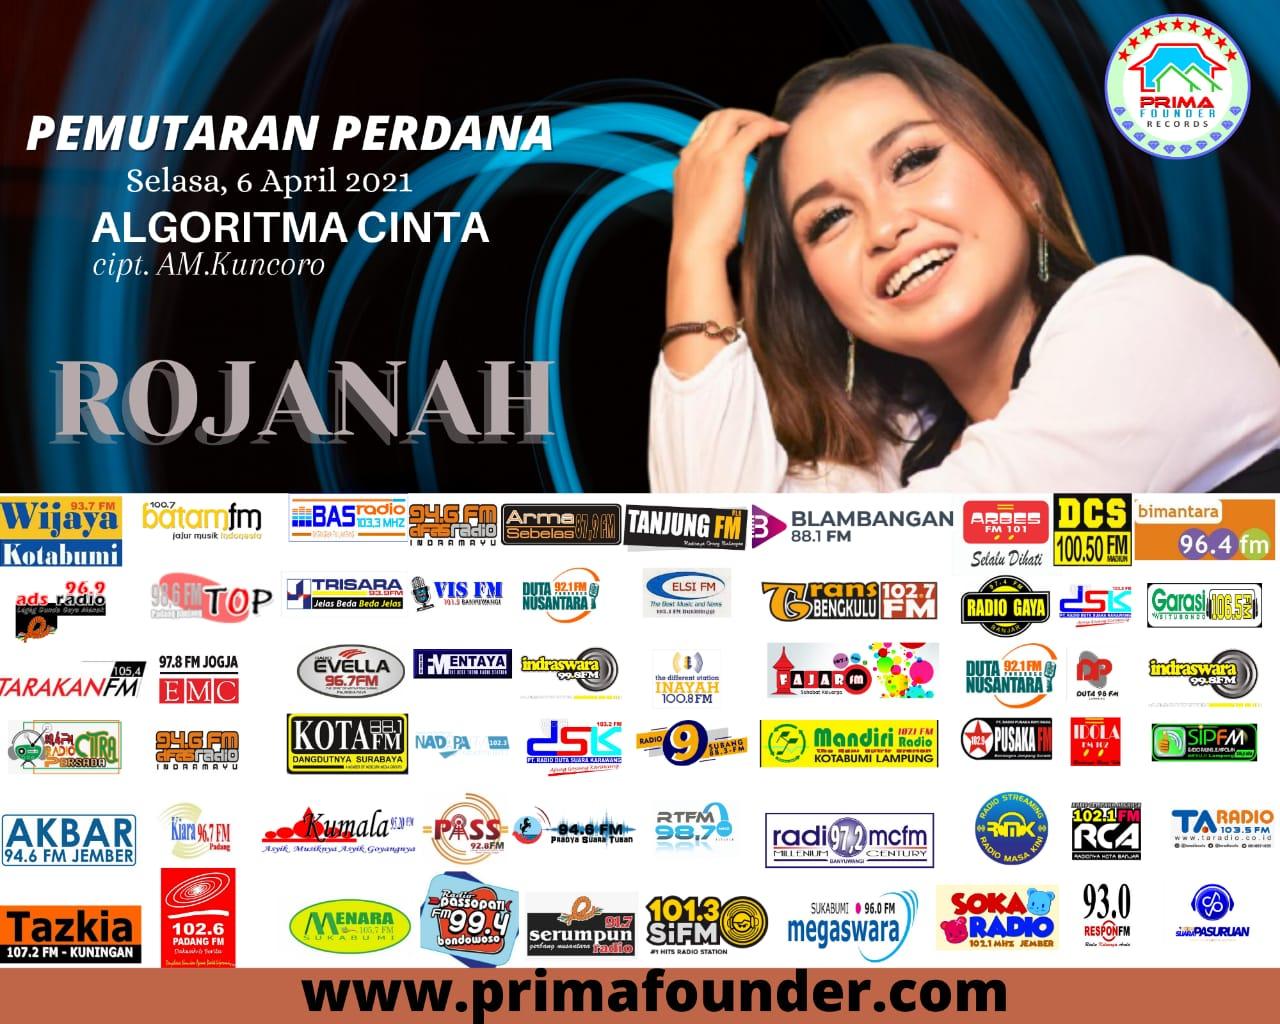 Flayer Rojanah rilis lagu Algoritma Cinta karya AM. Kuncoro di 60 stasiun radio se-Indonesia. (Dok. Istimewa)